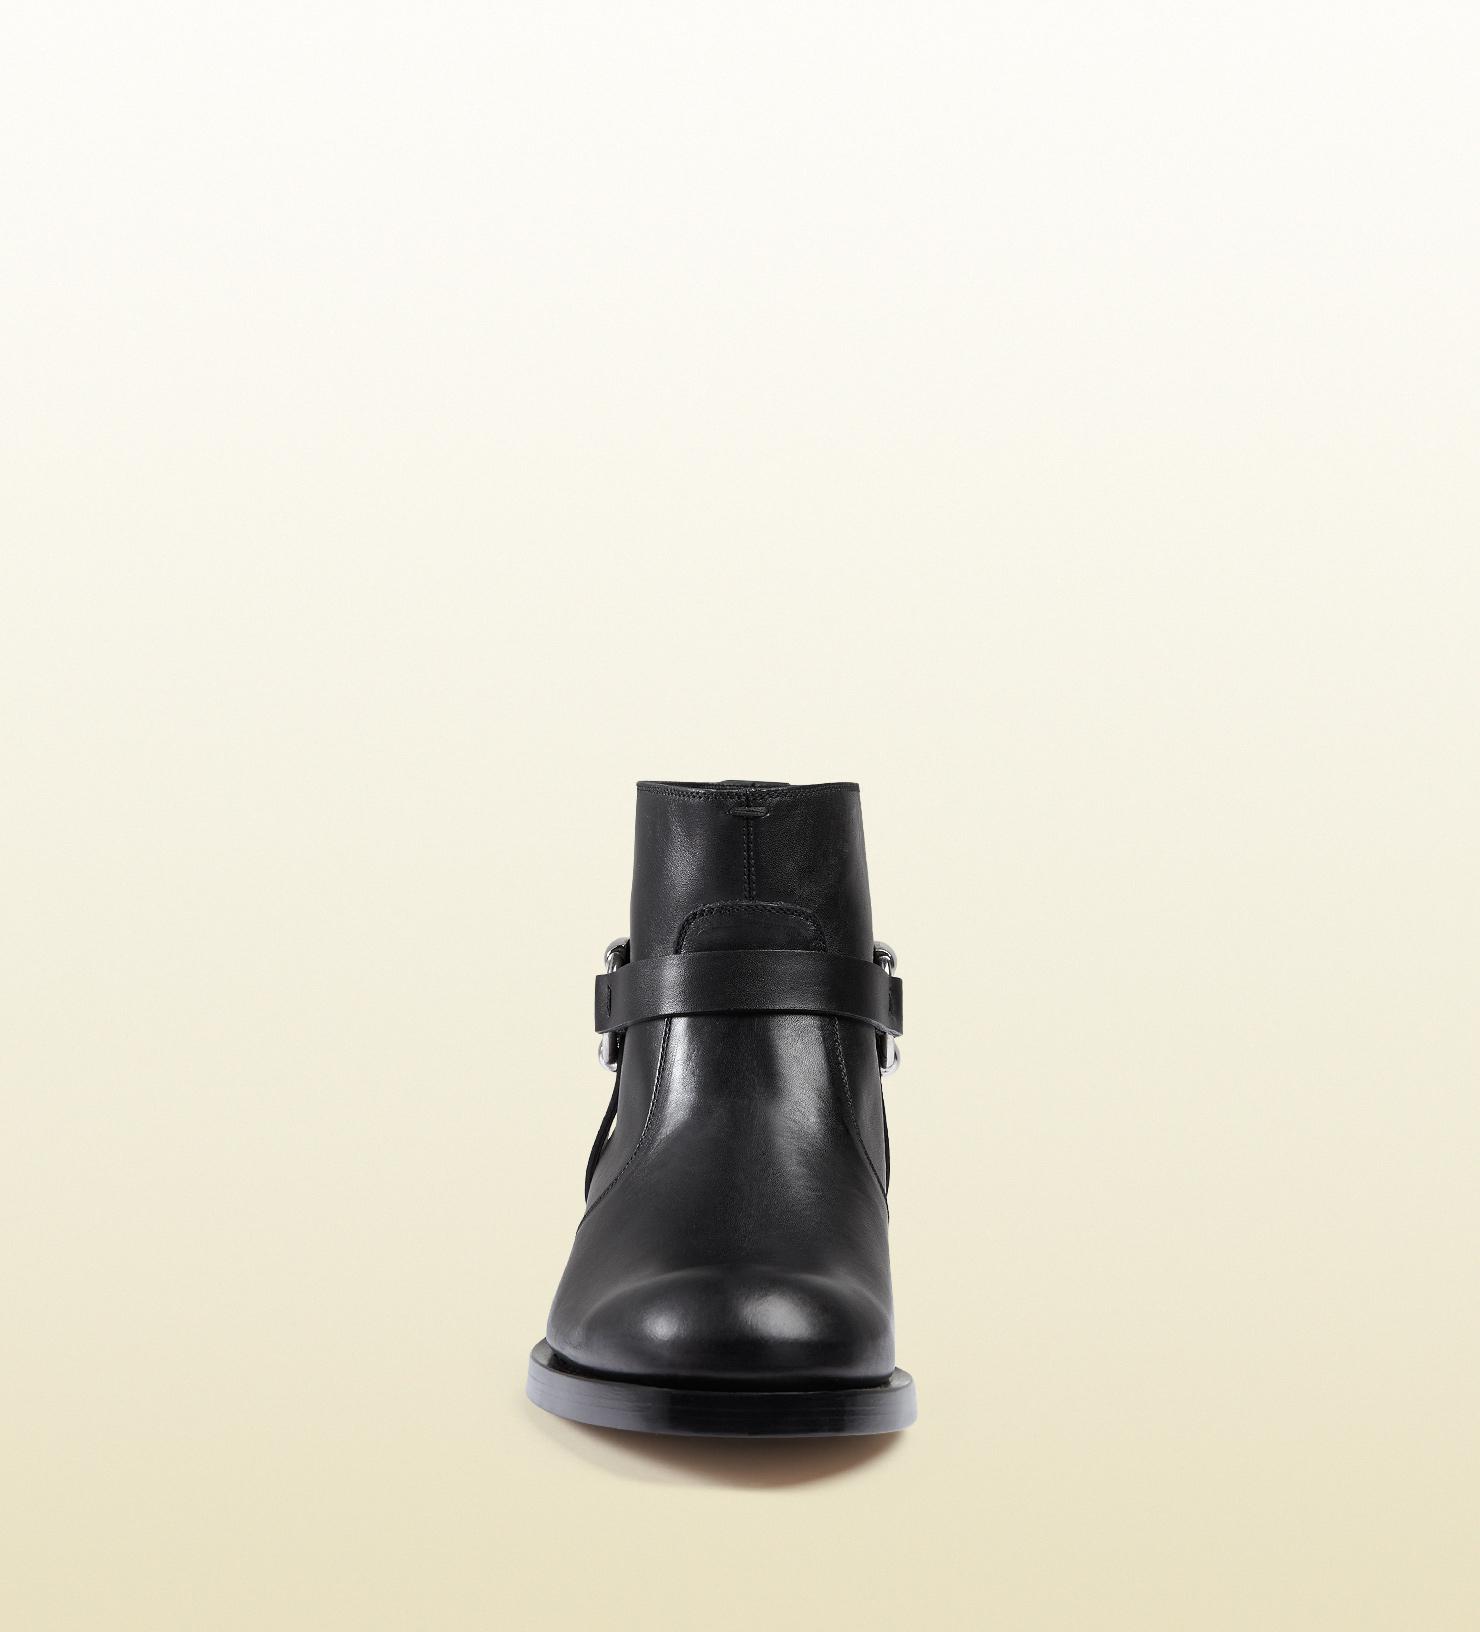 Black gucci boots for men